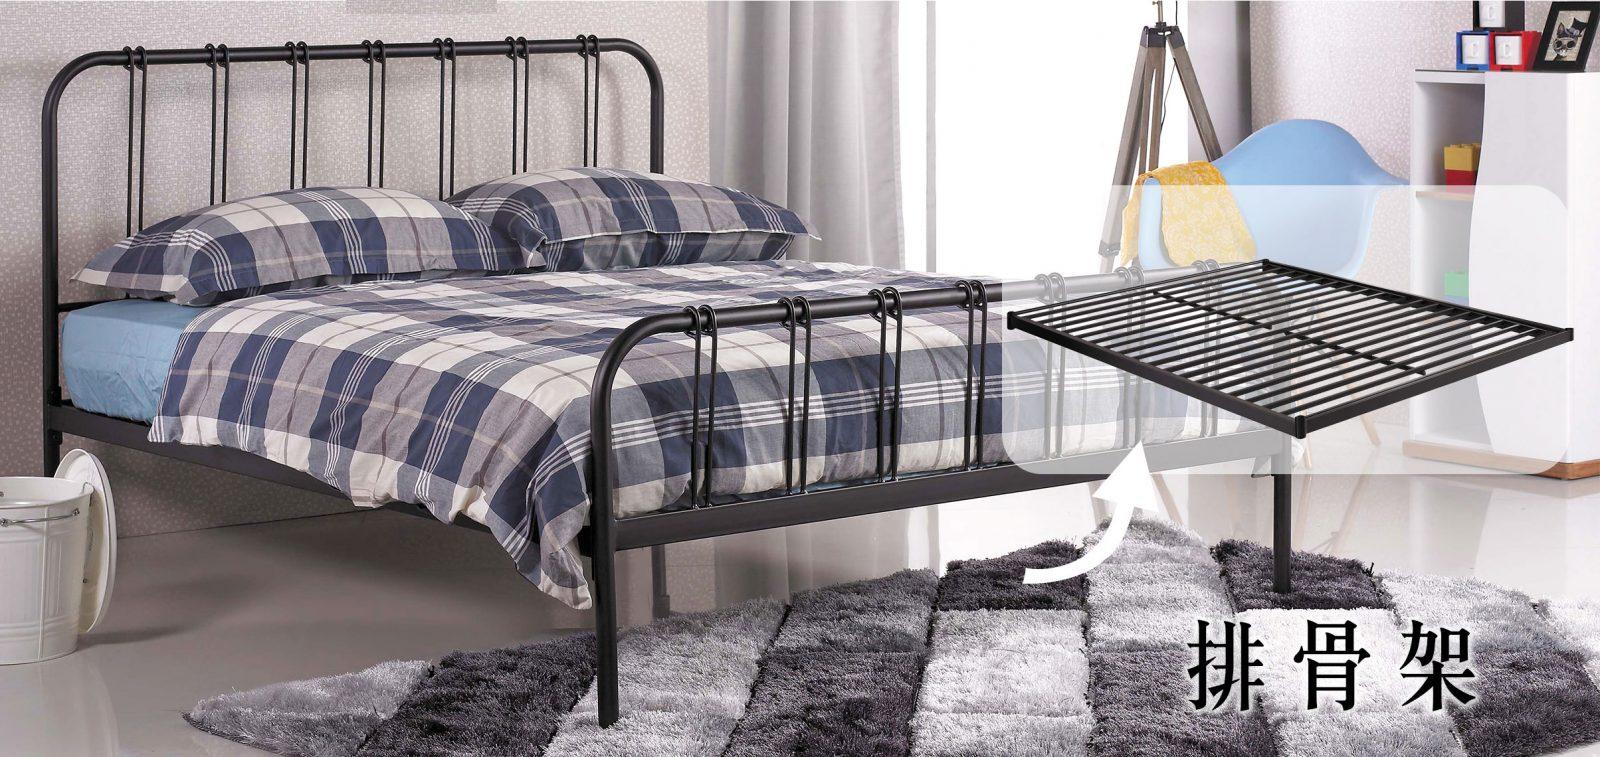 UR Design 床架 排骨架